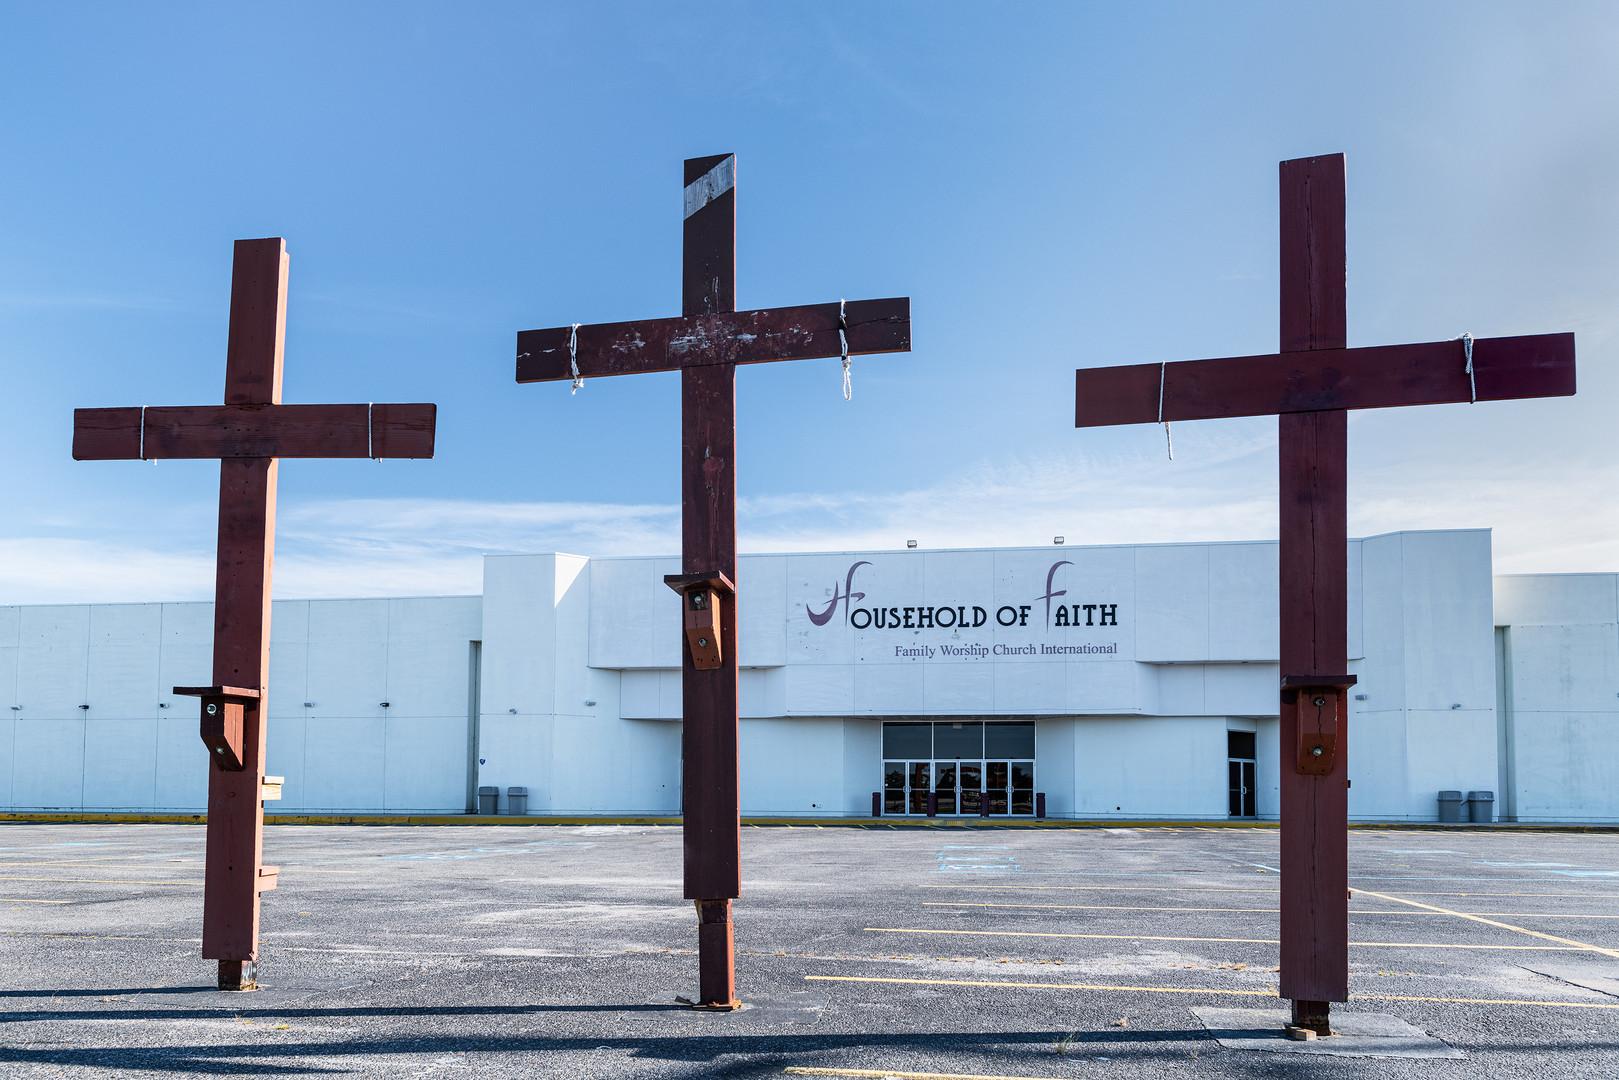 """Household of Faith, I-10 Service Rd, New Orleans"""